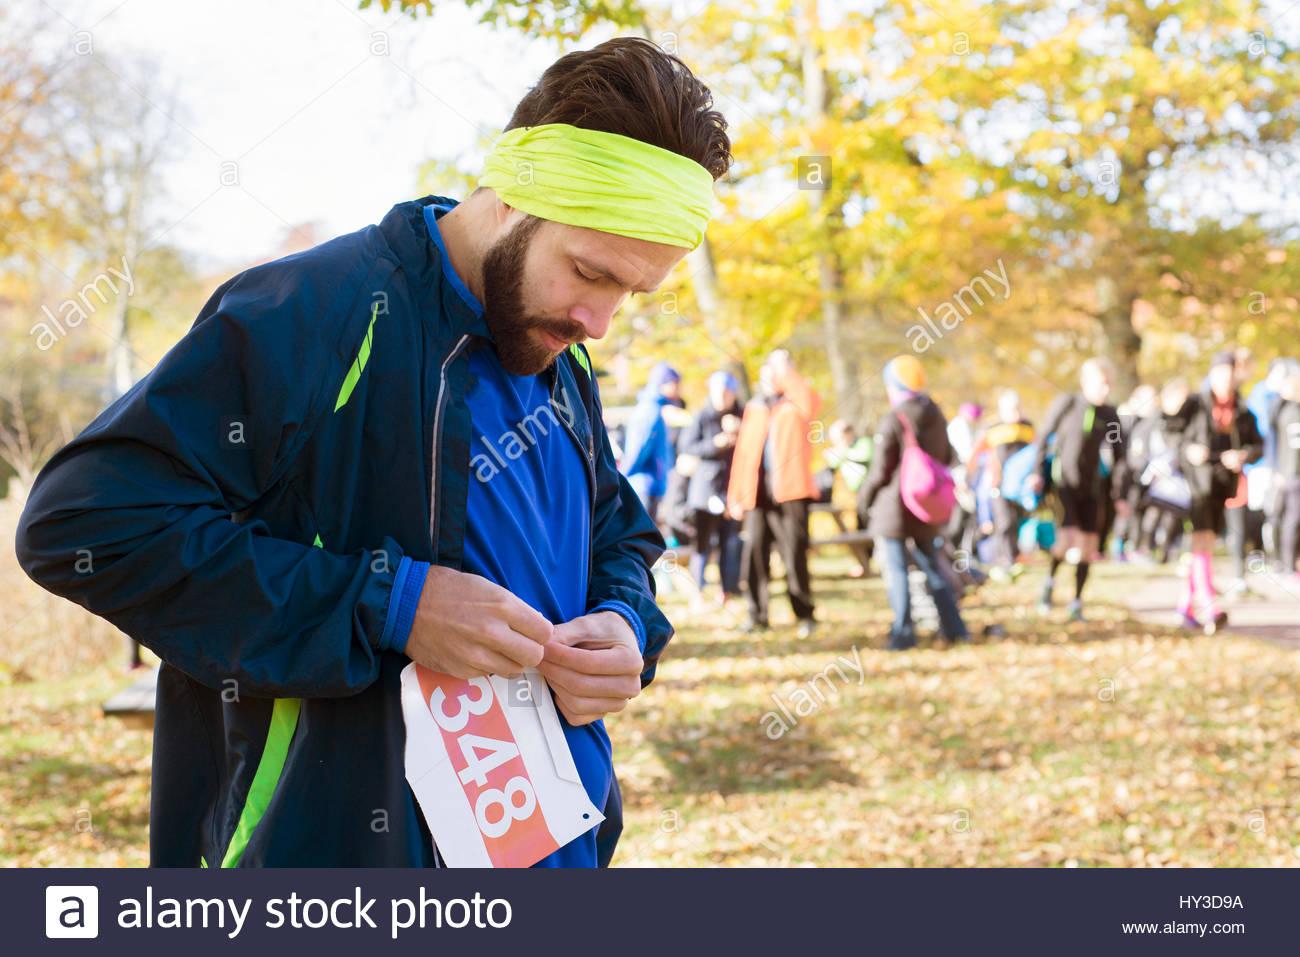 Sweden, Man wearing sports clothing preparing to race - Stock Image